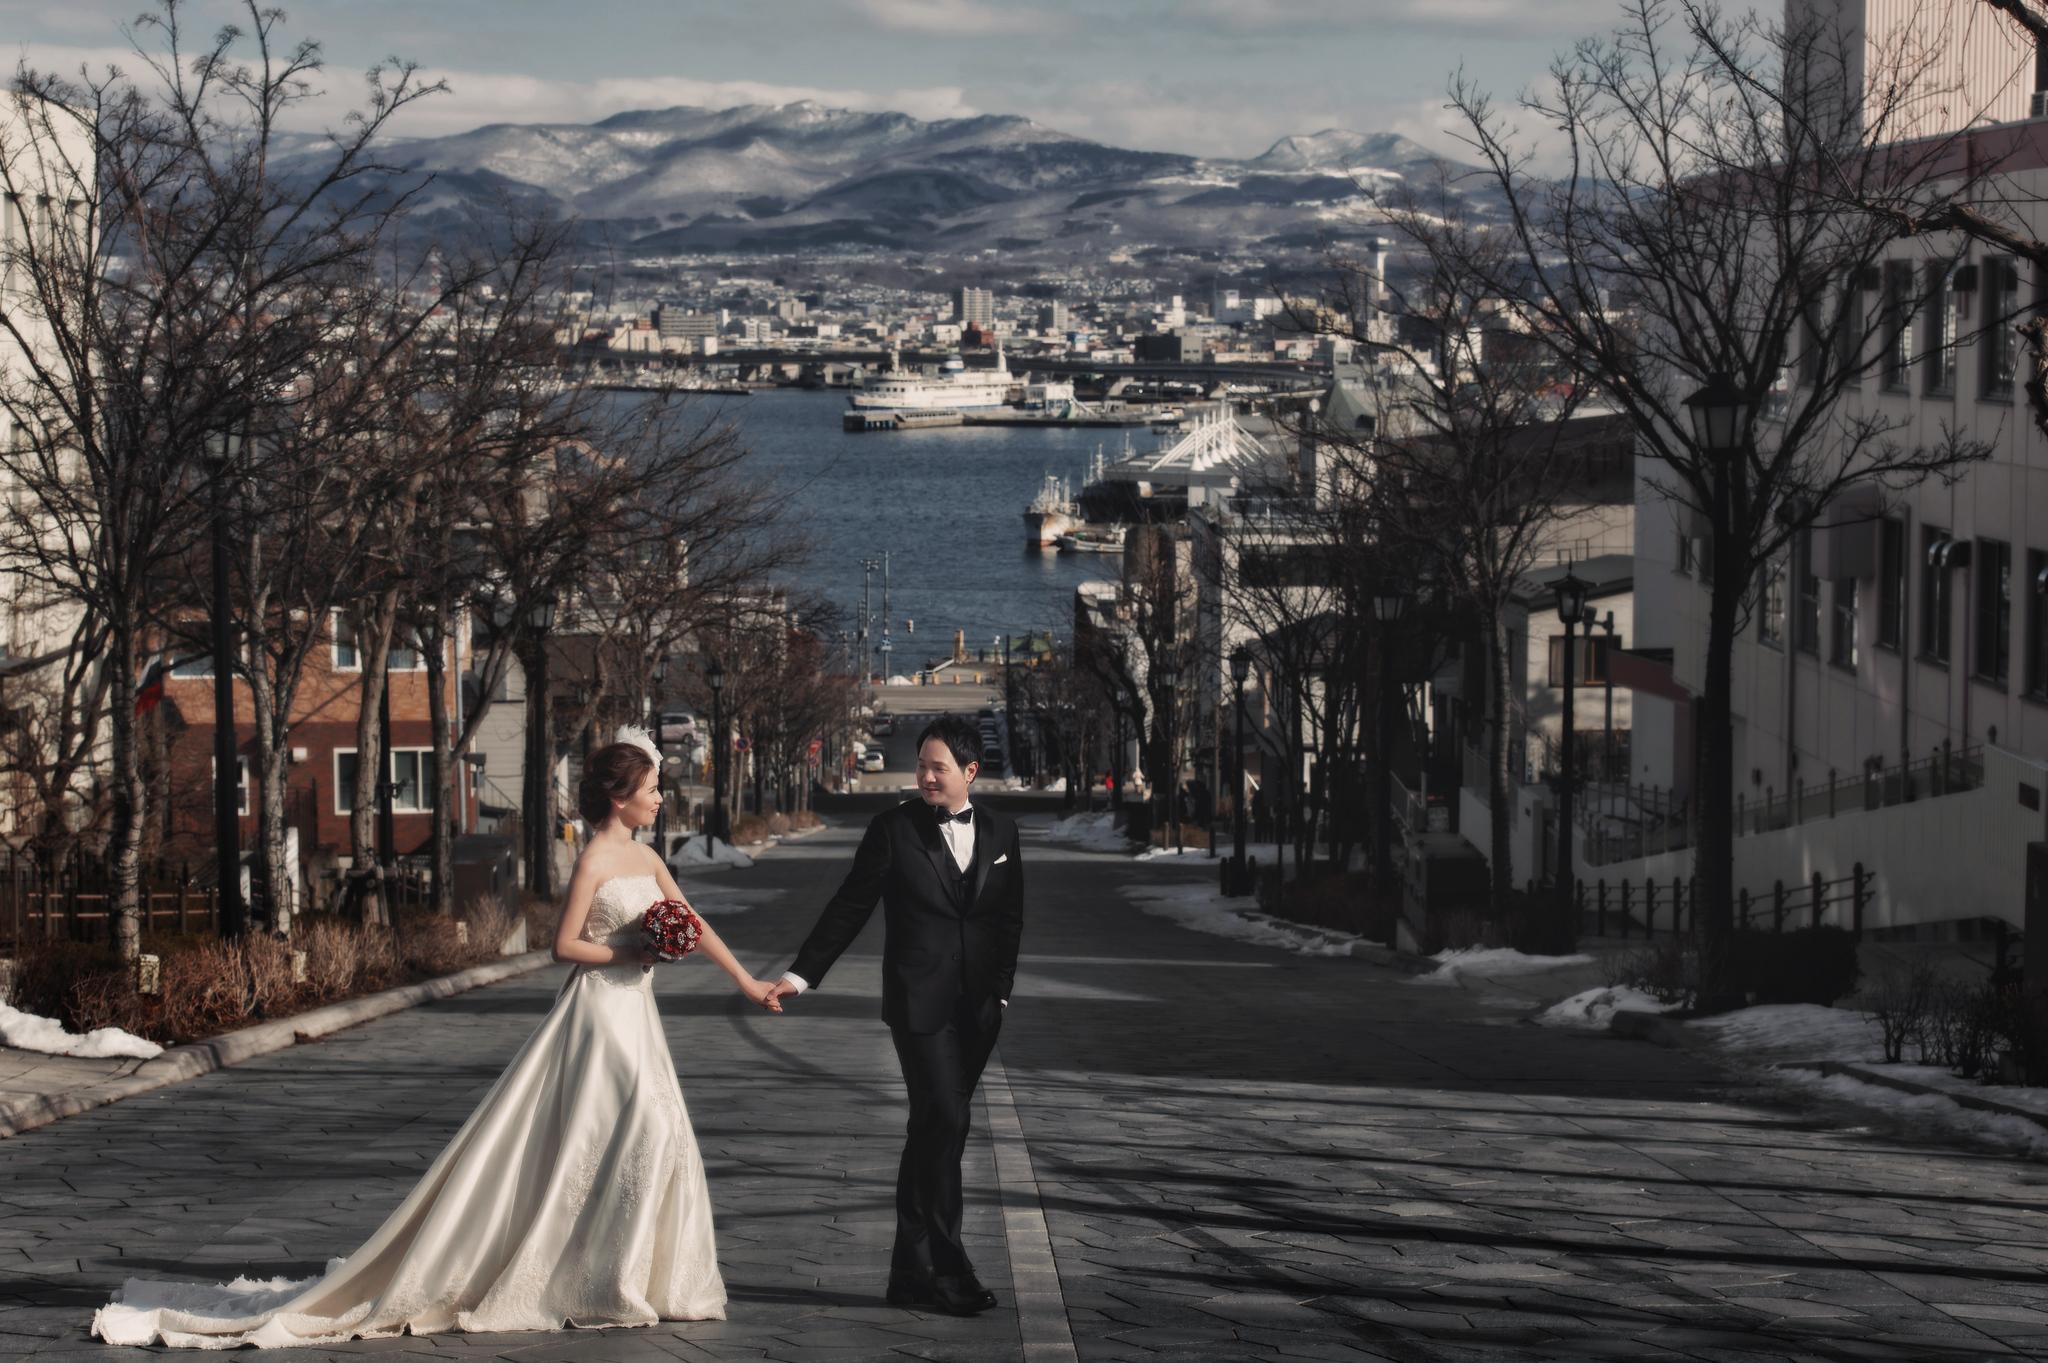 Donfer, 海外婚紗, World tour, 東法, EASTERN WEDDING, 世界旅拍, Hokkaido, 北海道婚紗